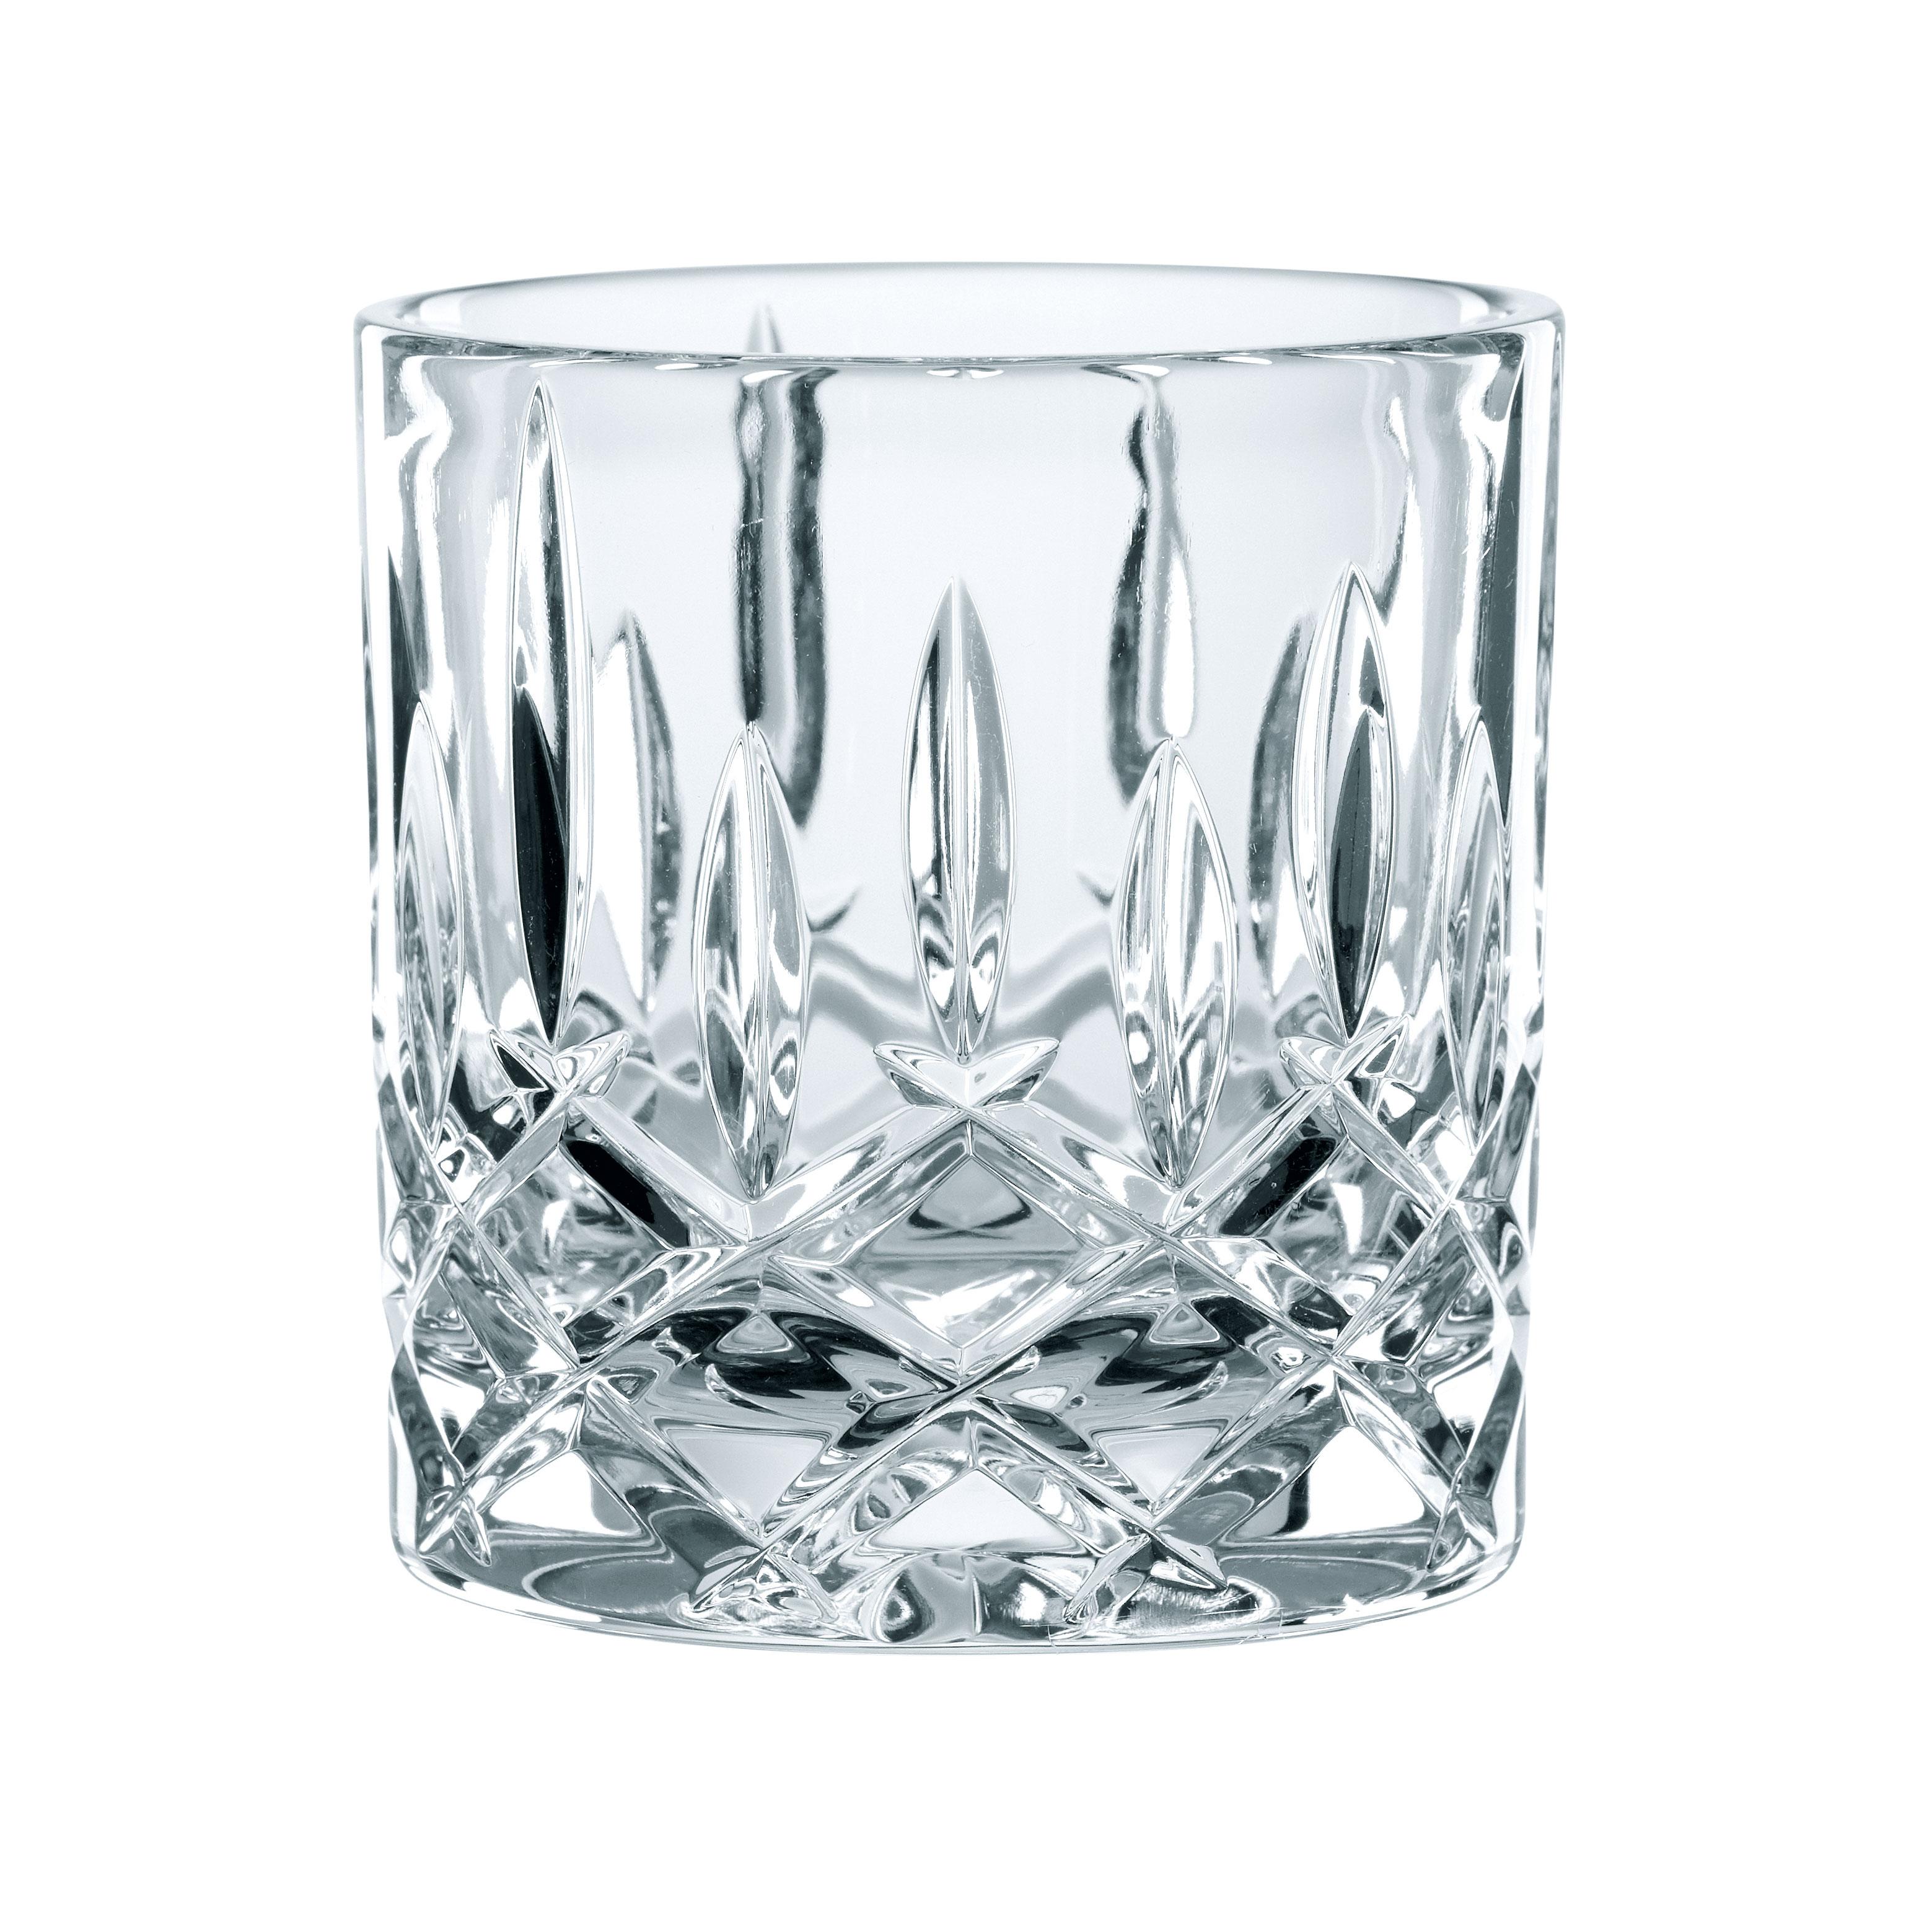 Libbey Glass N98856 glass, old fashioned / rocks